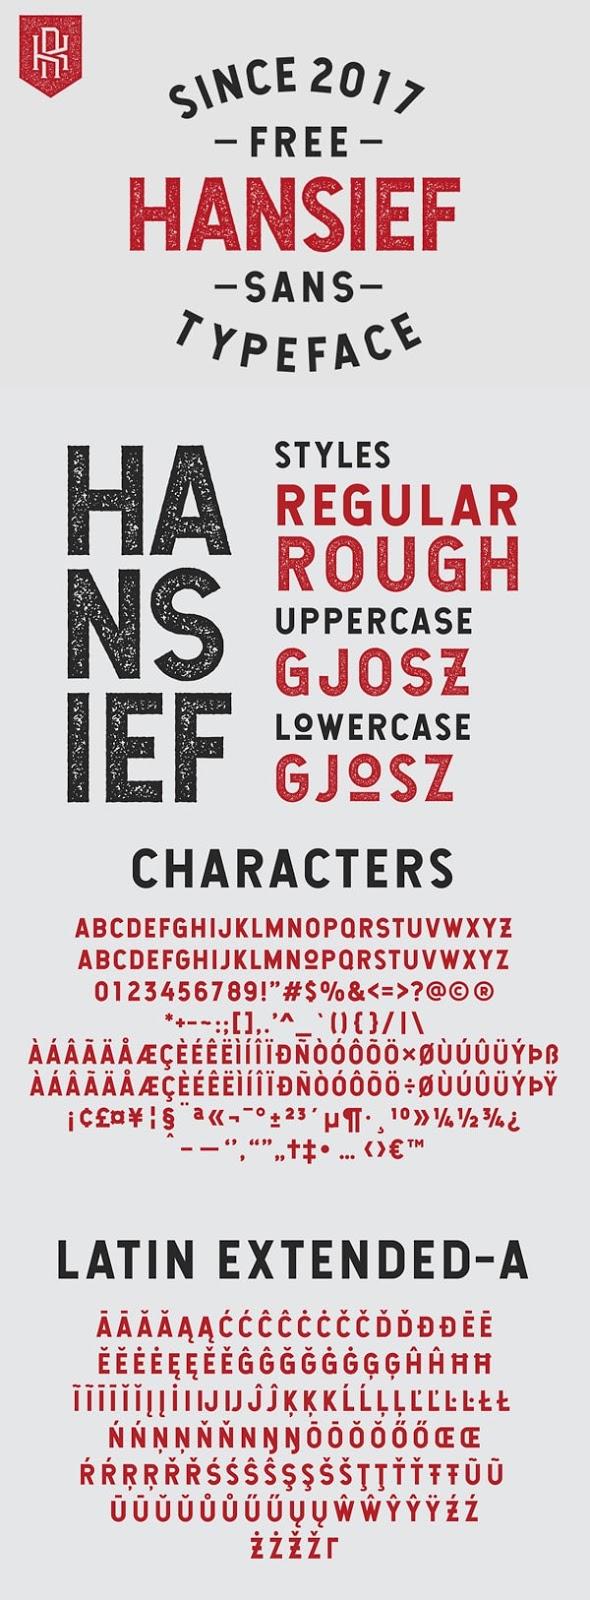 Vintage Font Gratis Terbaik - Hansief Free Vintage Font